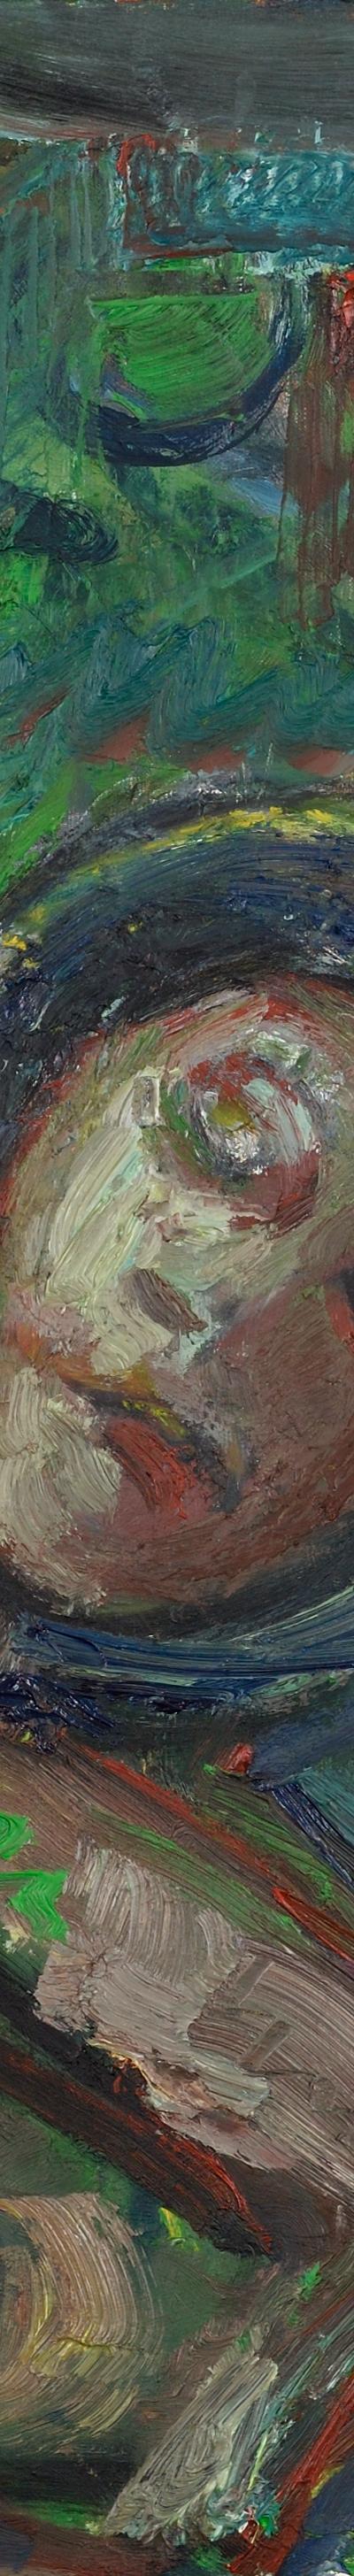 mumie 60x50 cm, oil on canvas